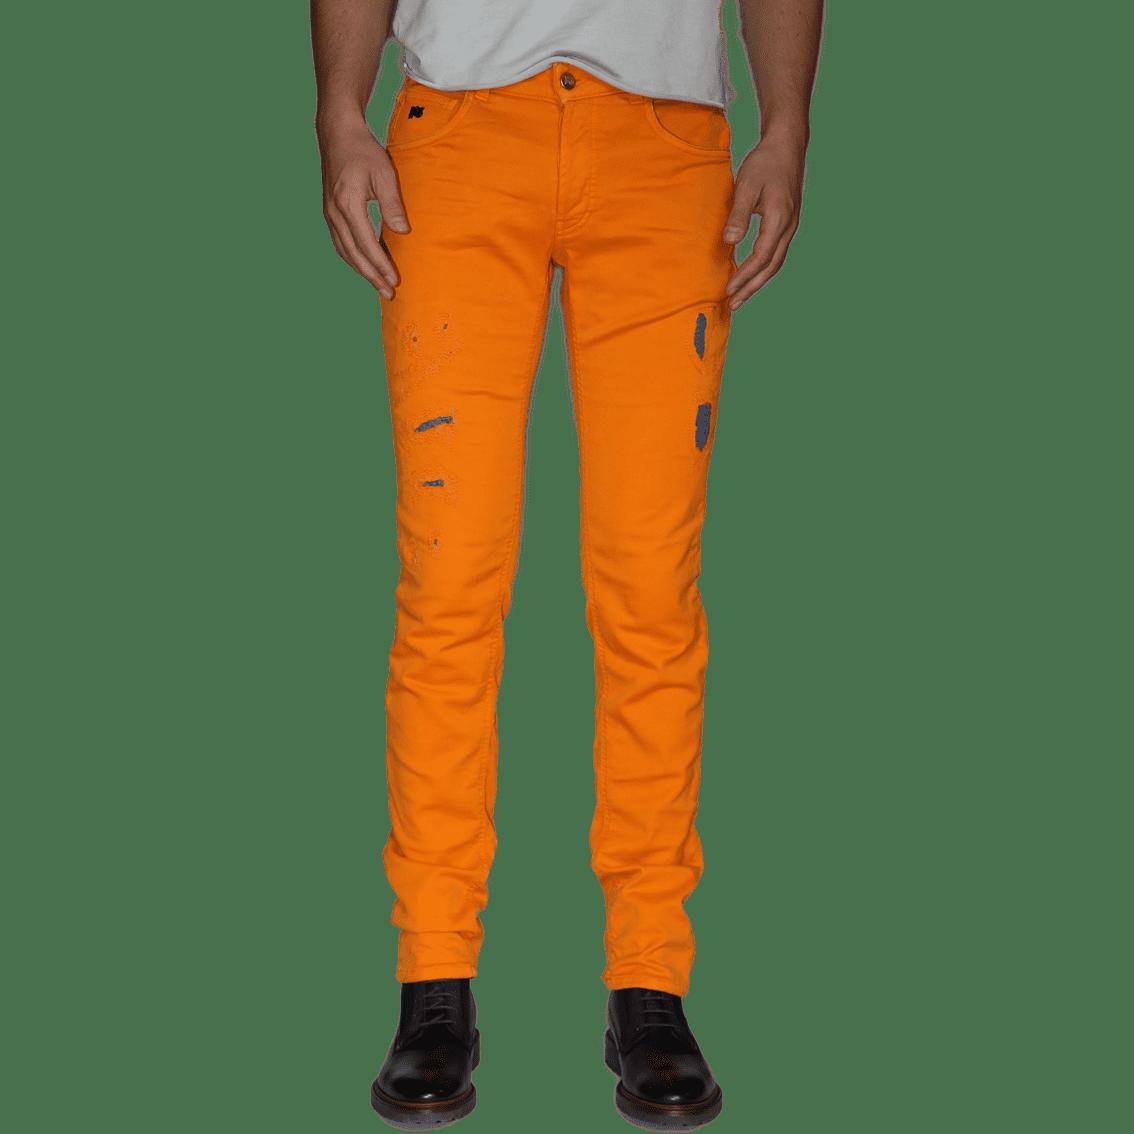 Cabinero Stiles Berlin PG Enjoy Jeans, Herrenhosen, made in Italy AW17-18 denim curry blue